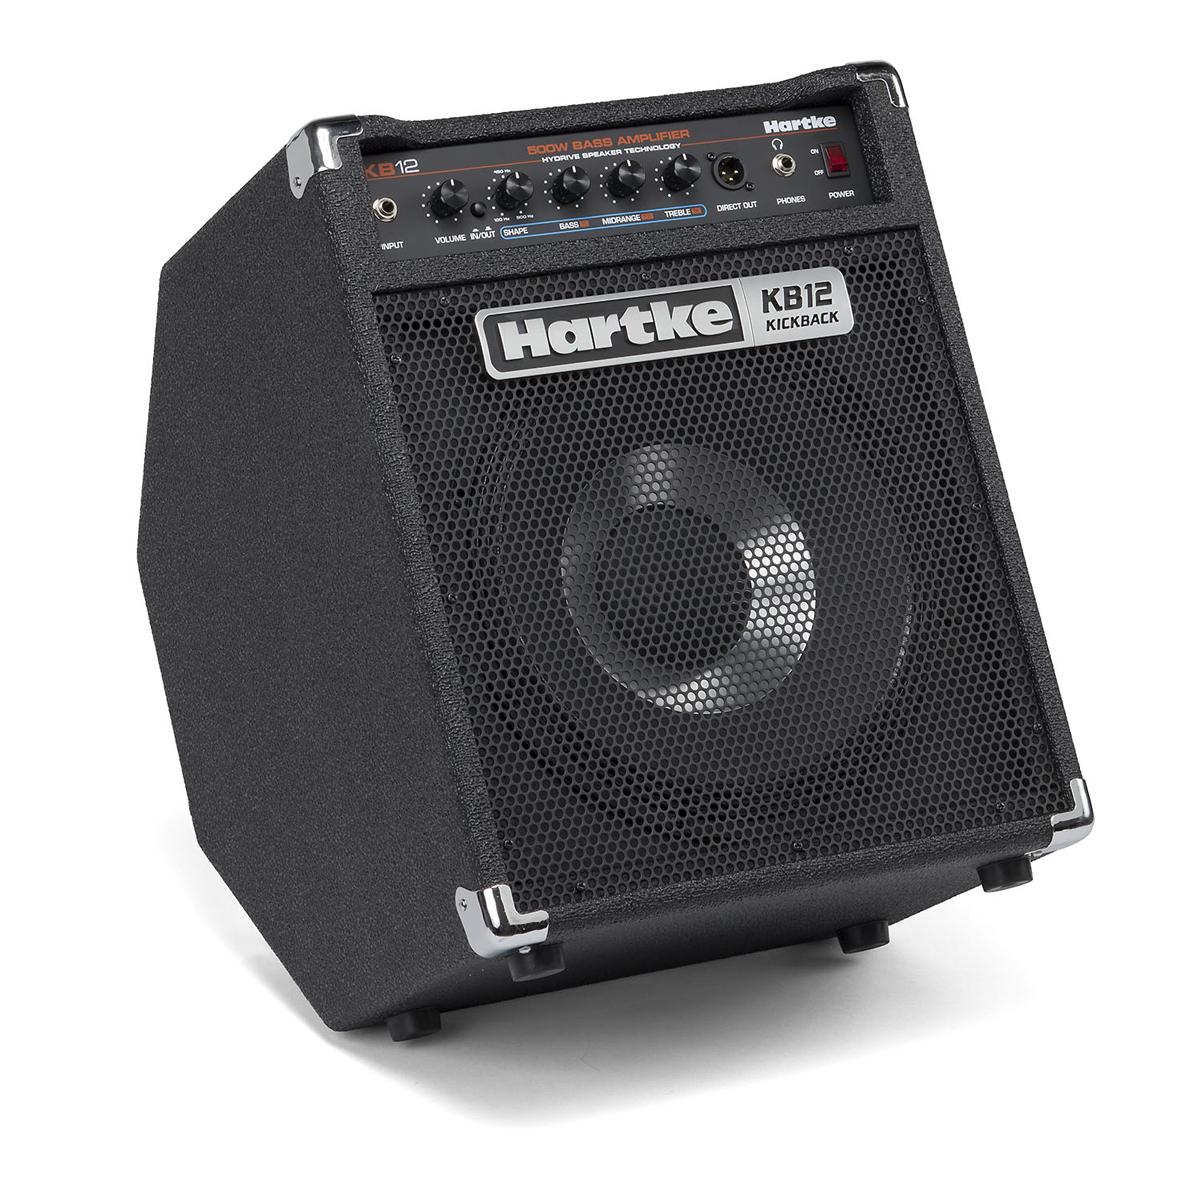 Hartke ハートキー / Kickback 12 Bass Combo(KB12 )ベース・ コンボ【お取り寄せ商品】